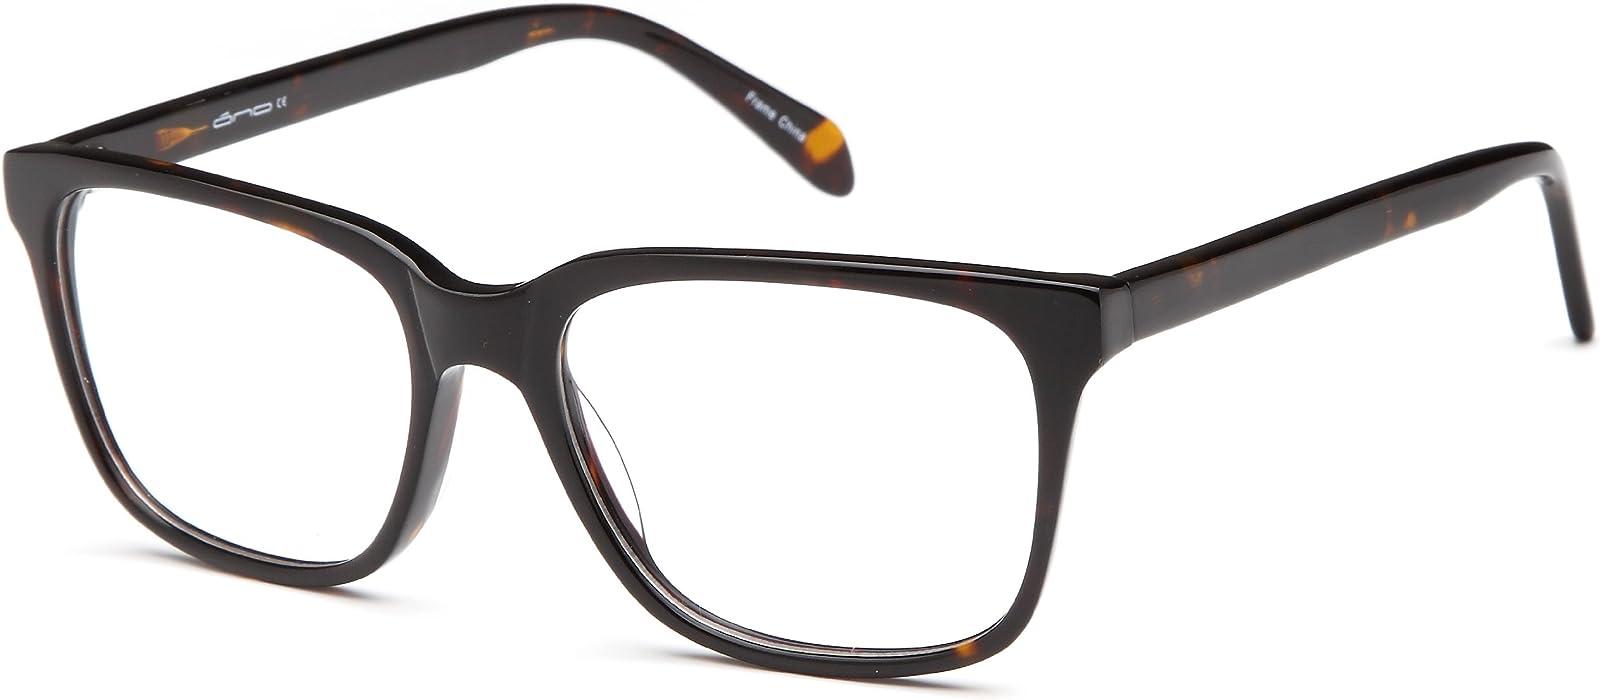 Amazon.com: Mens Prescription Glasses Frames Rxable in Large ...